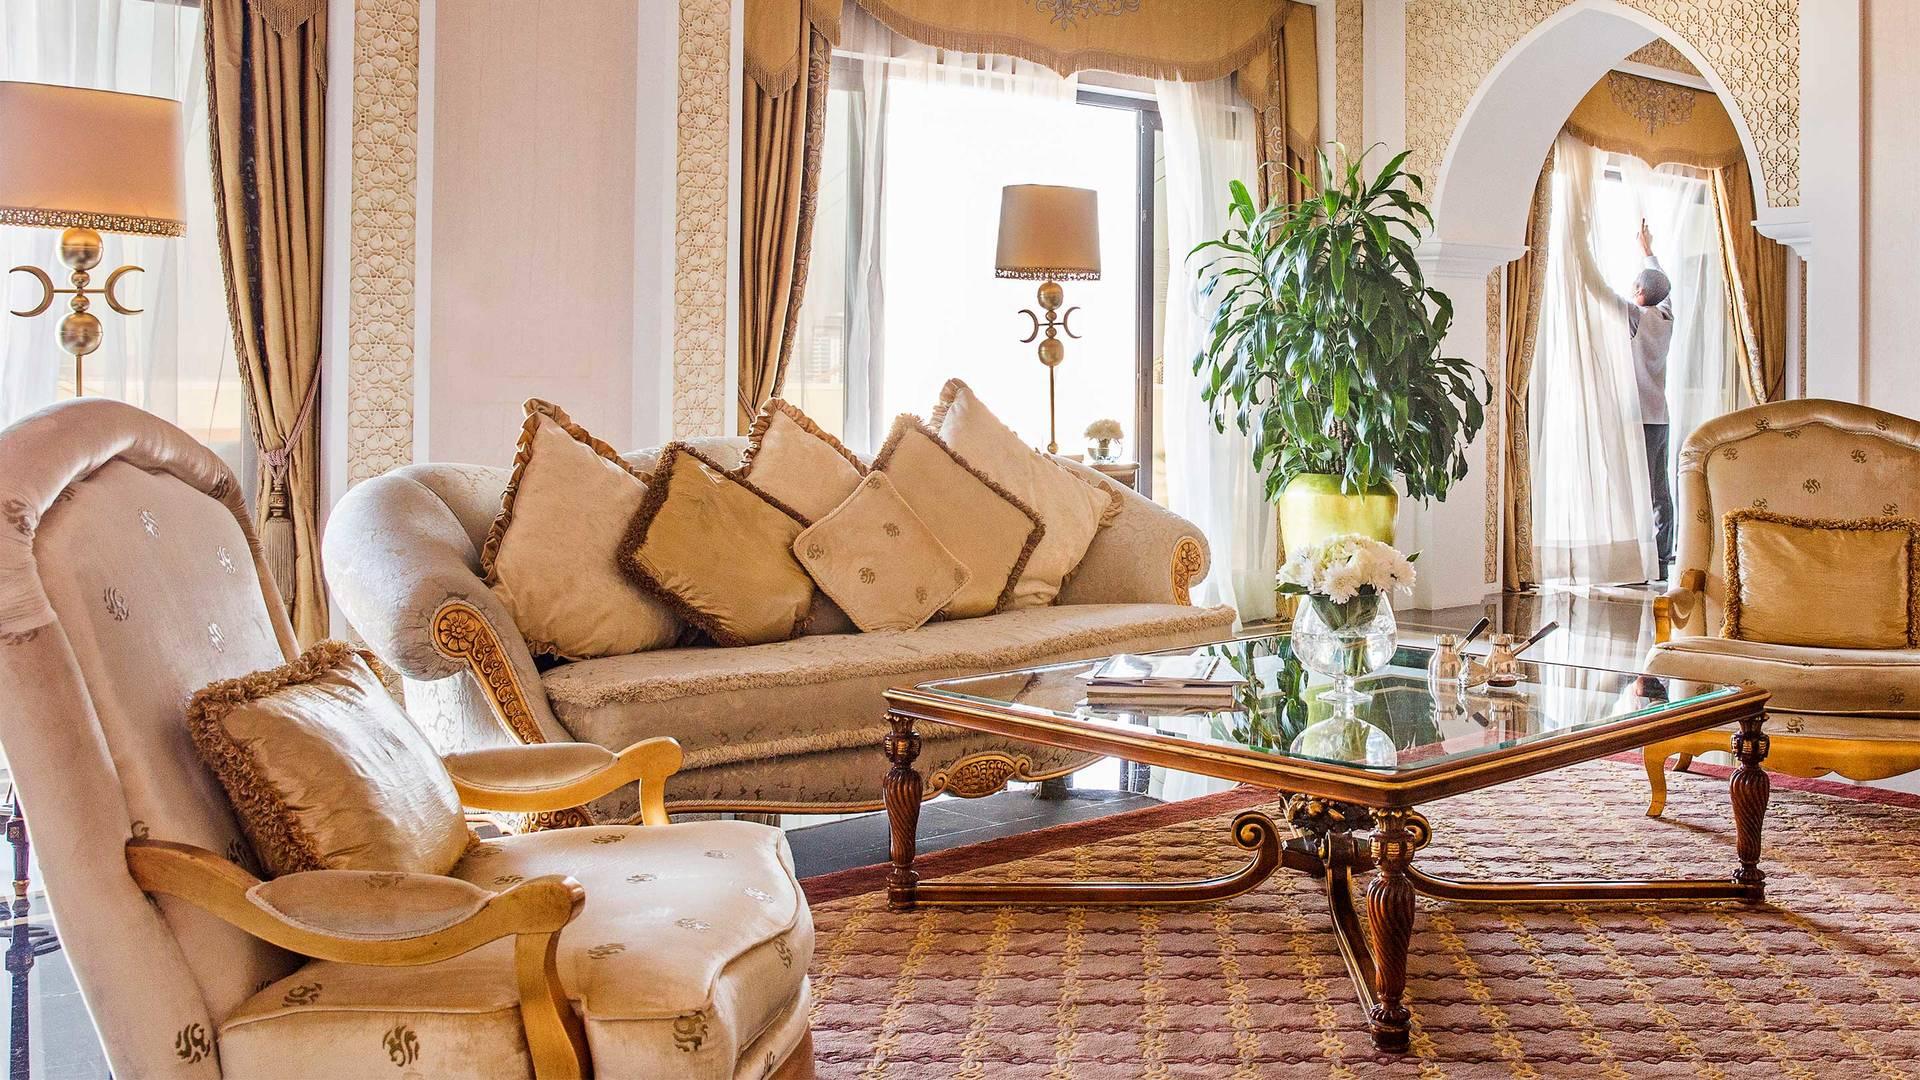 16-9 Room Jumeirah Zabeel Saray Imperial Suite Sitting Room 03